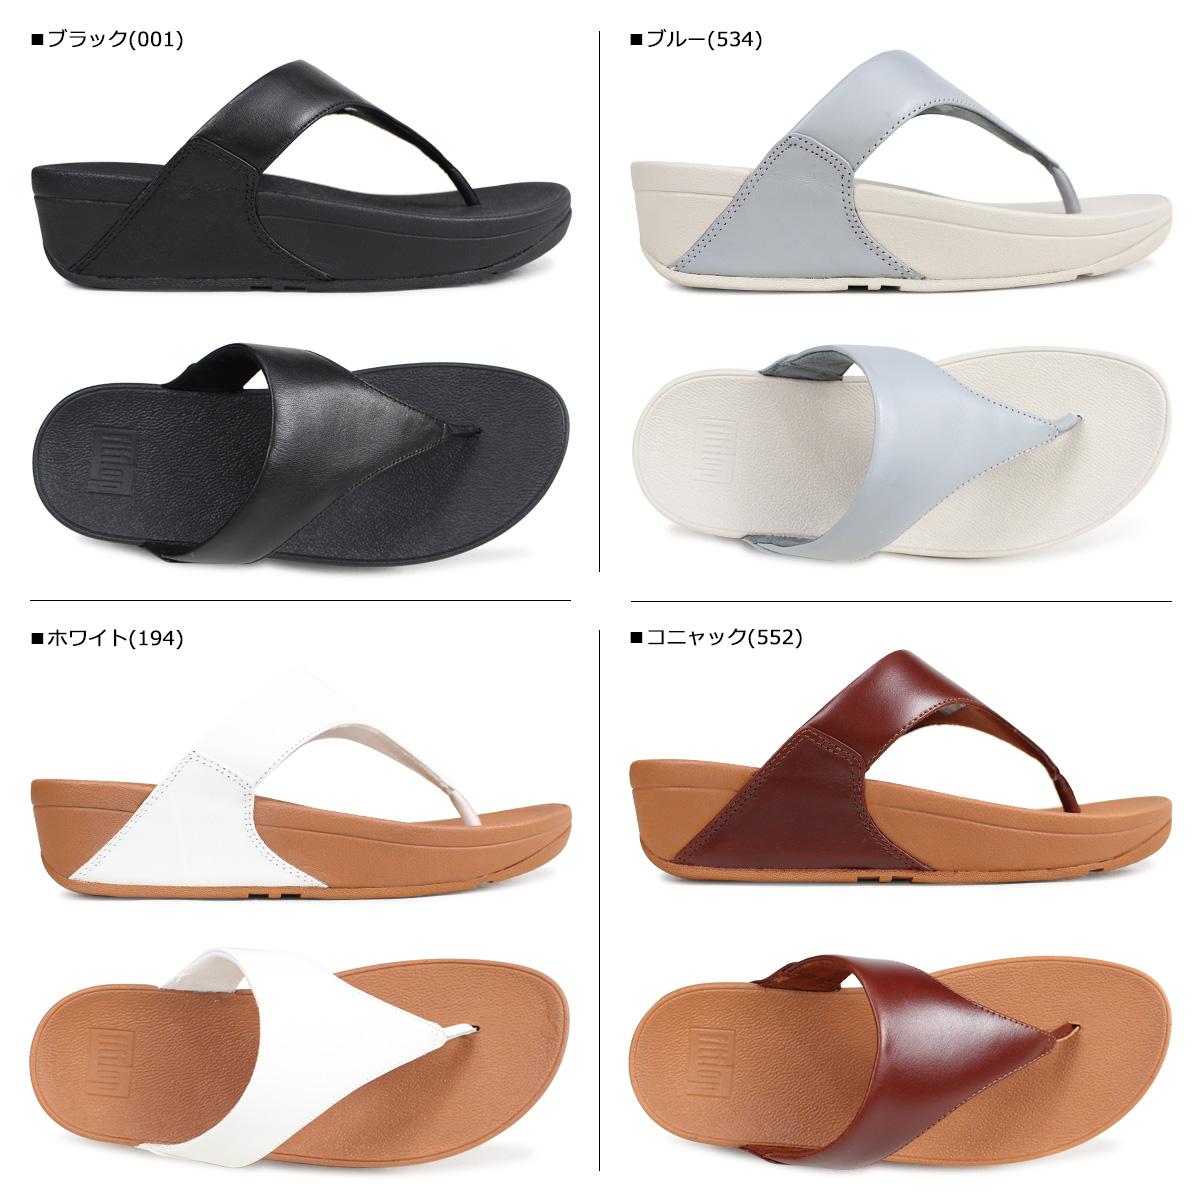 a569839af Fitting FLOP sandals FitFlop Lulu LULU LEATHER TOE POST SANDALS Lady s I88  black gray brown  4 4 Shinnyu load